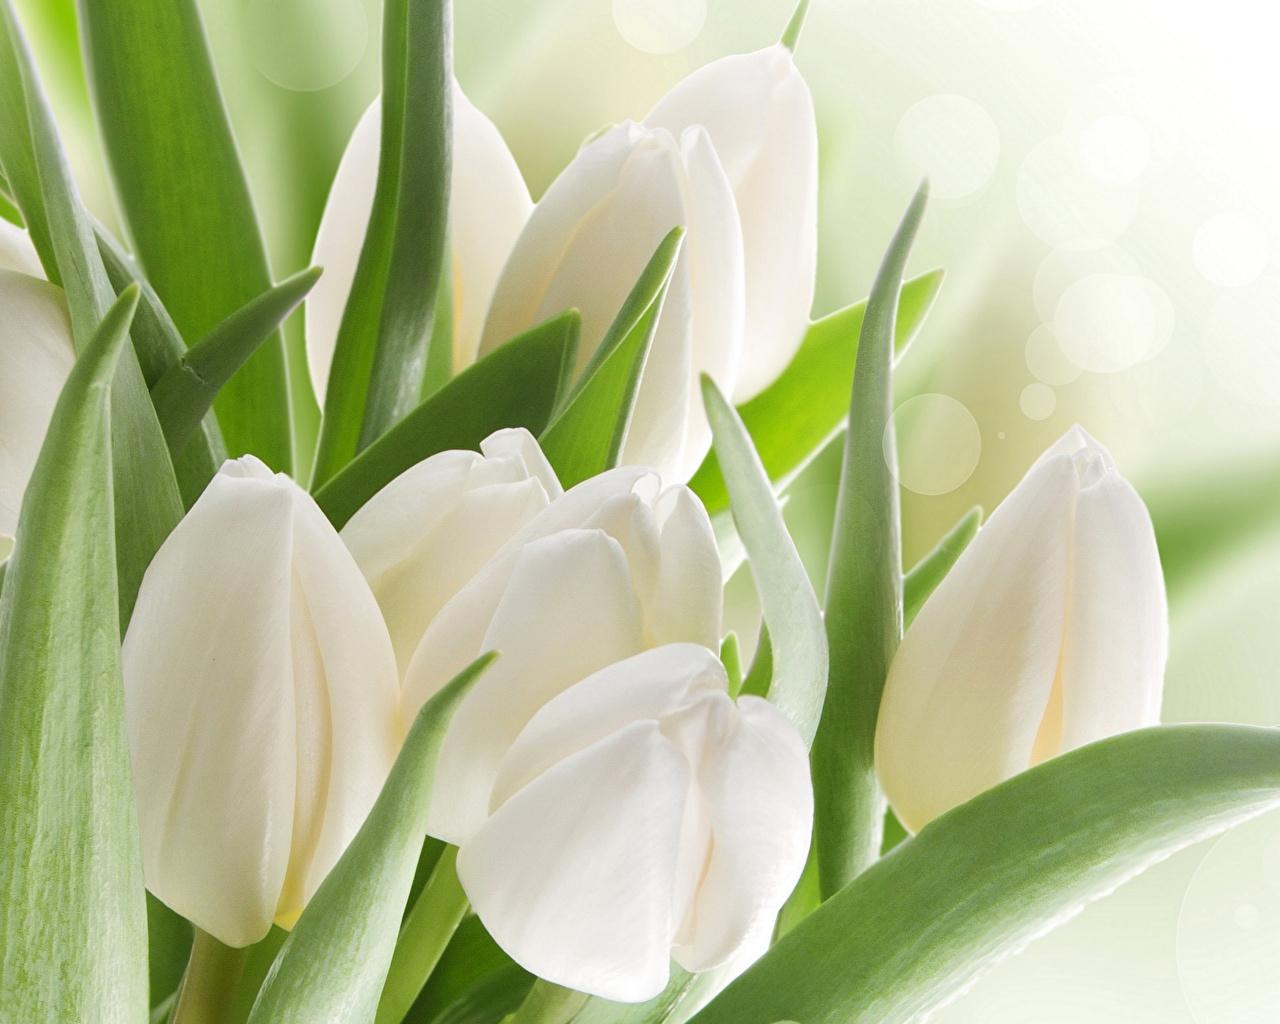 день ангела 22 апреля